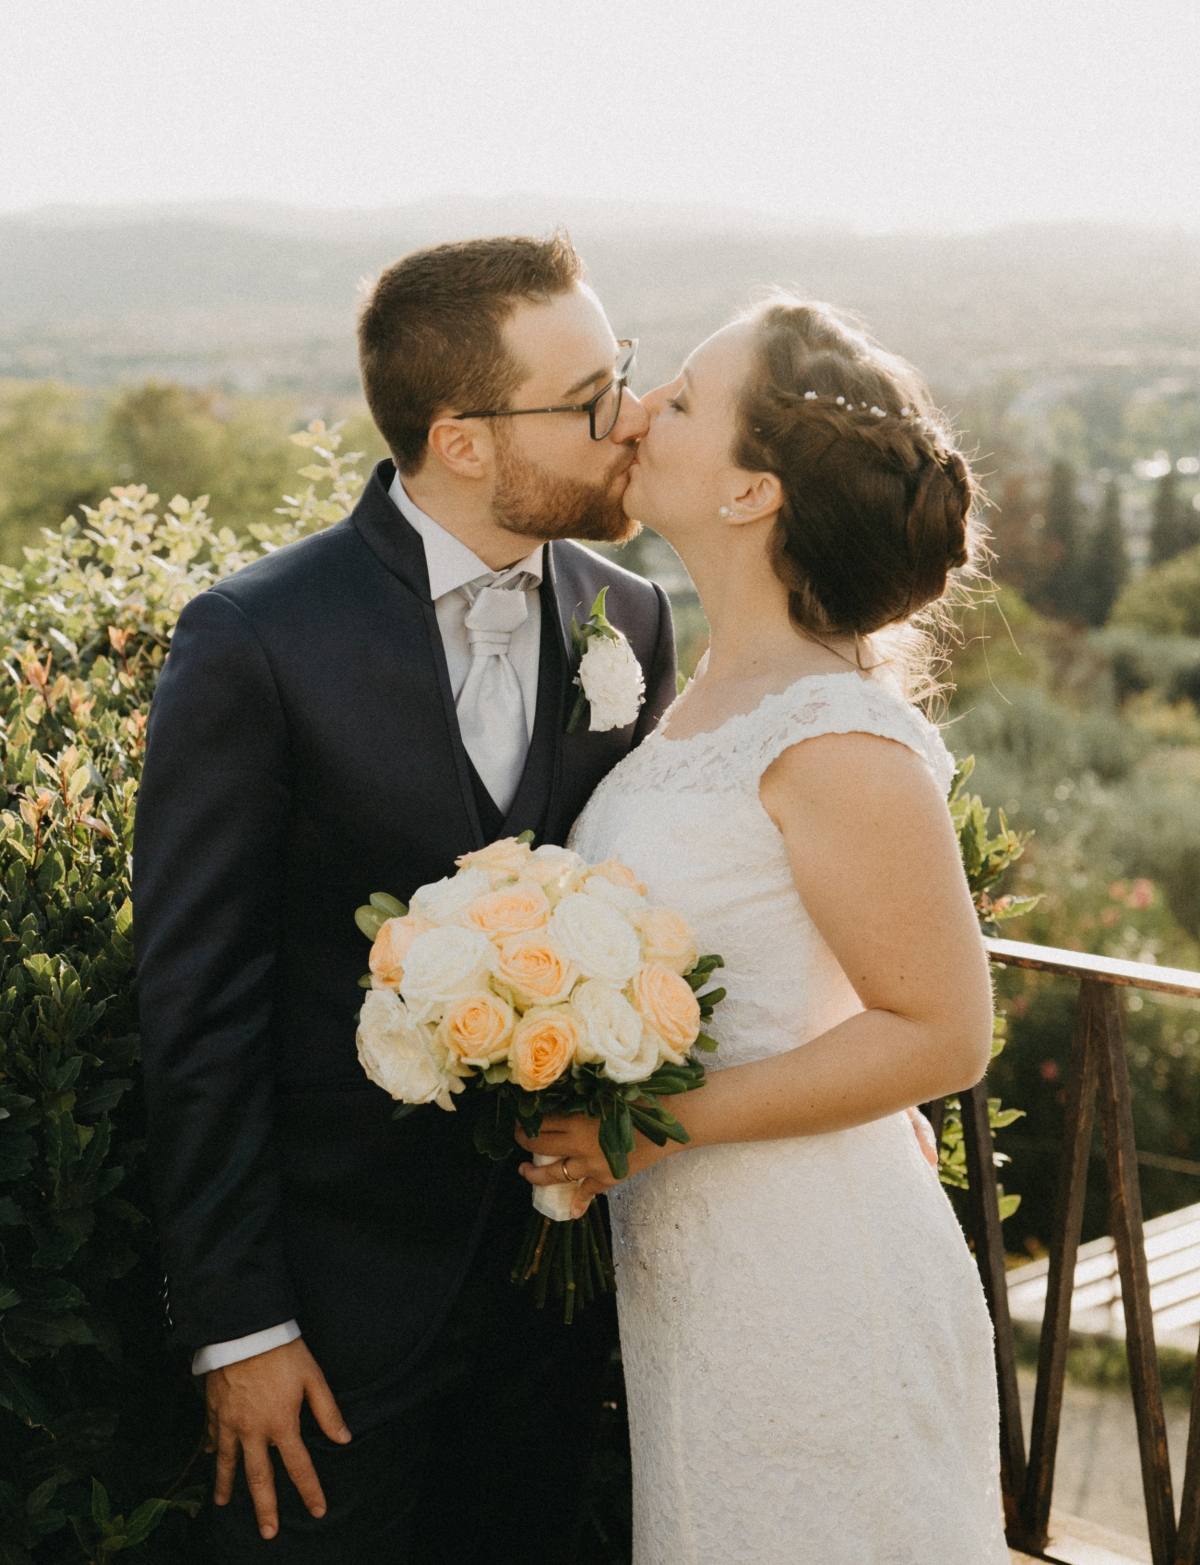 CLASSIC ITALIAN WEDDING   VILLA VIVIANI FLORENCE TUSCANY   ELEONORA&NICCOLÒ